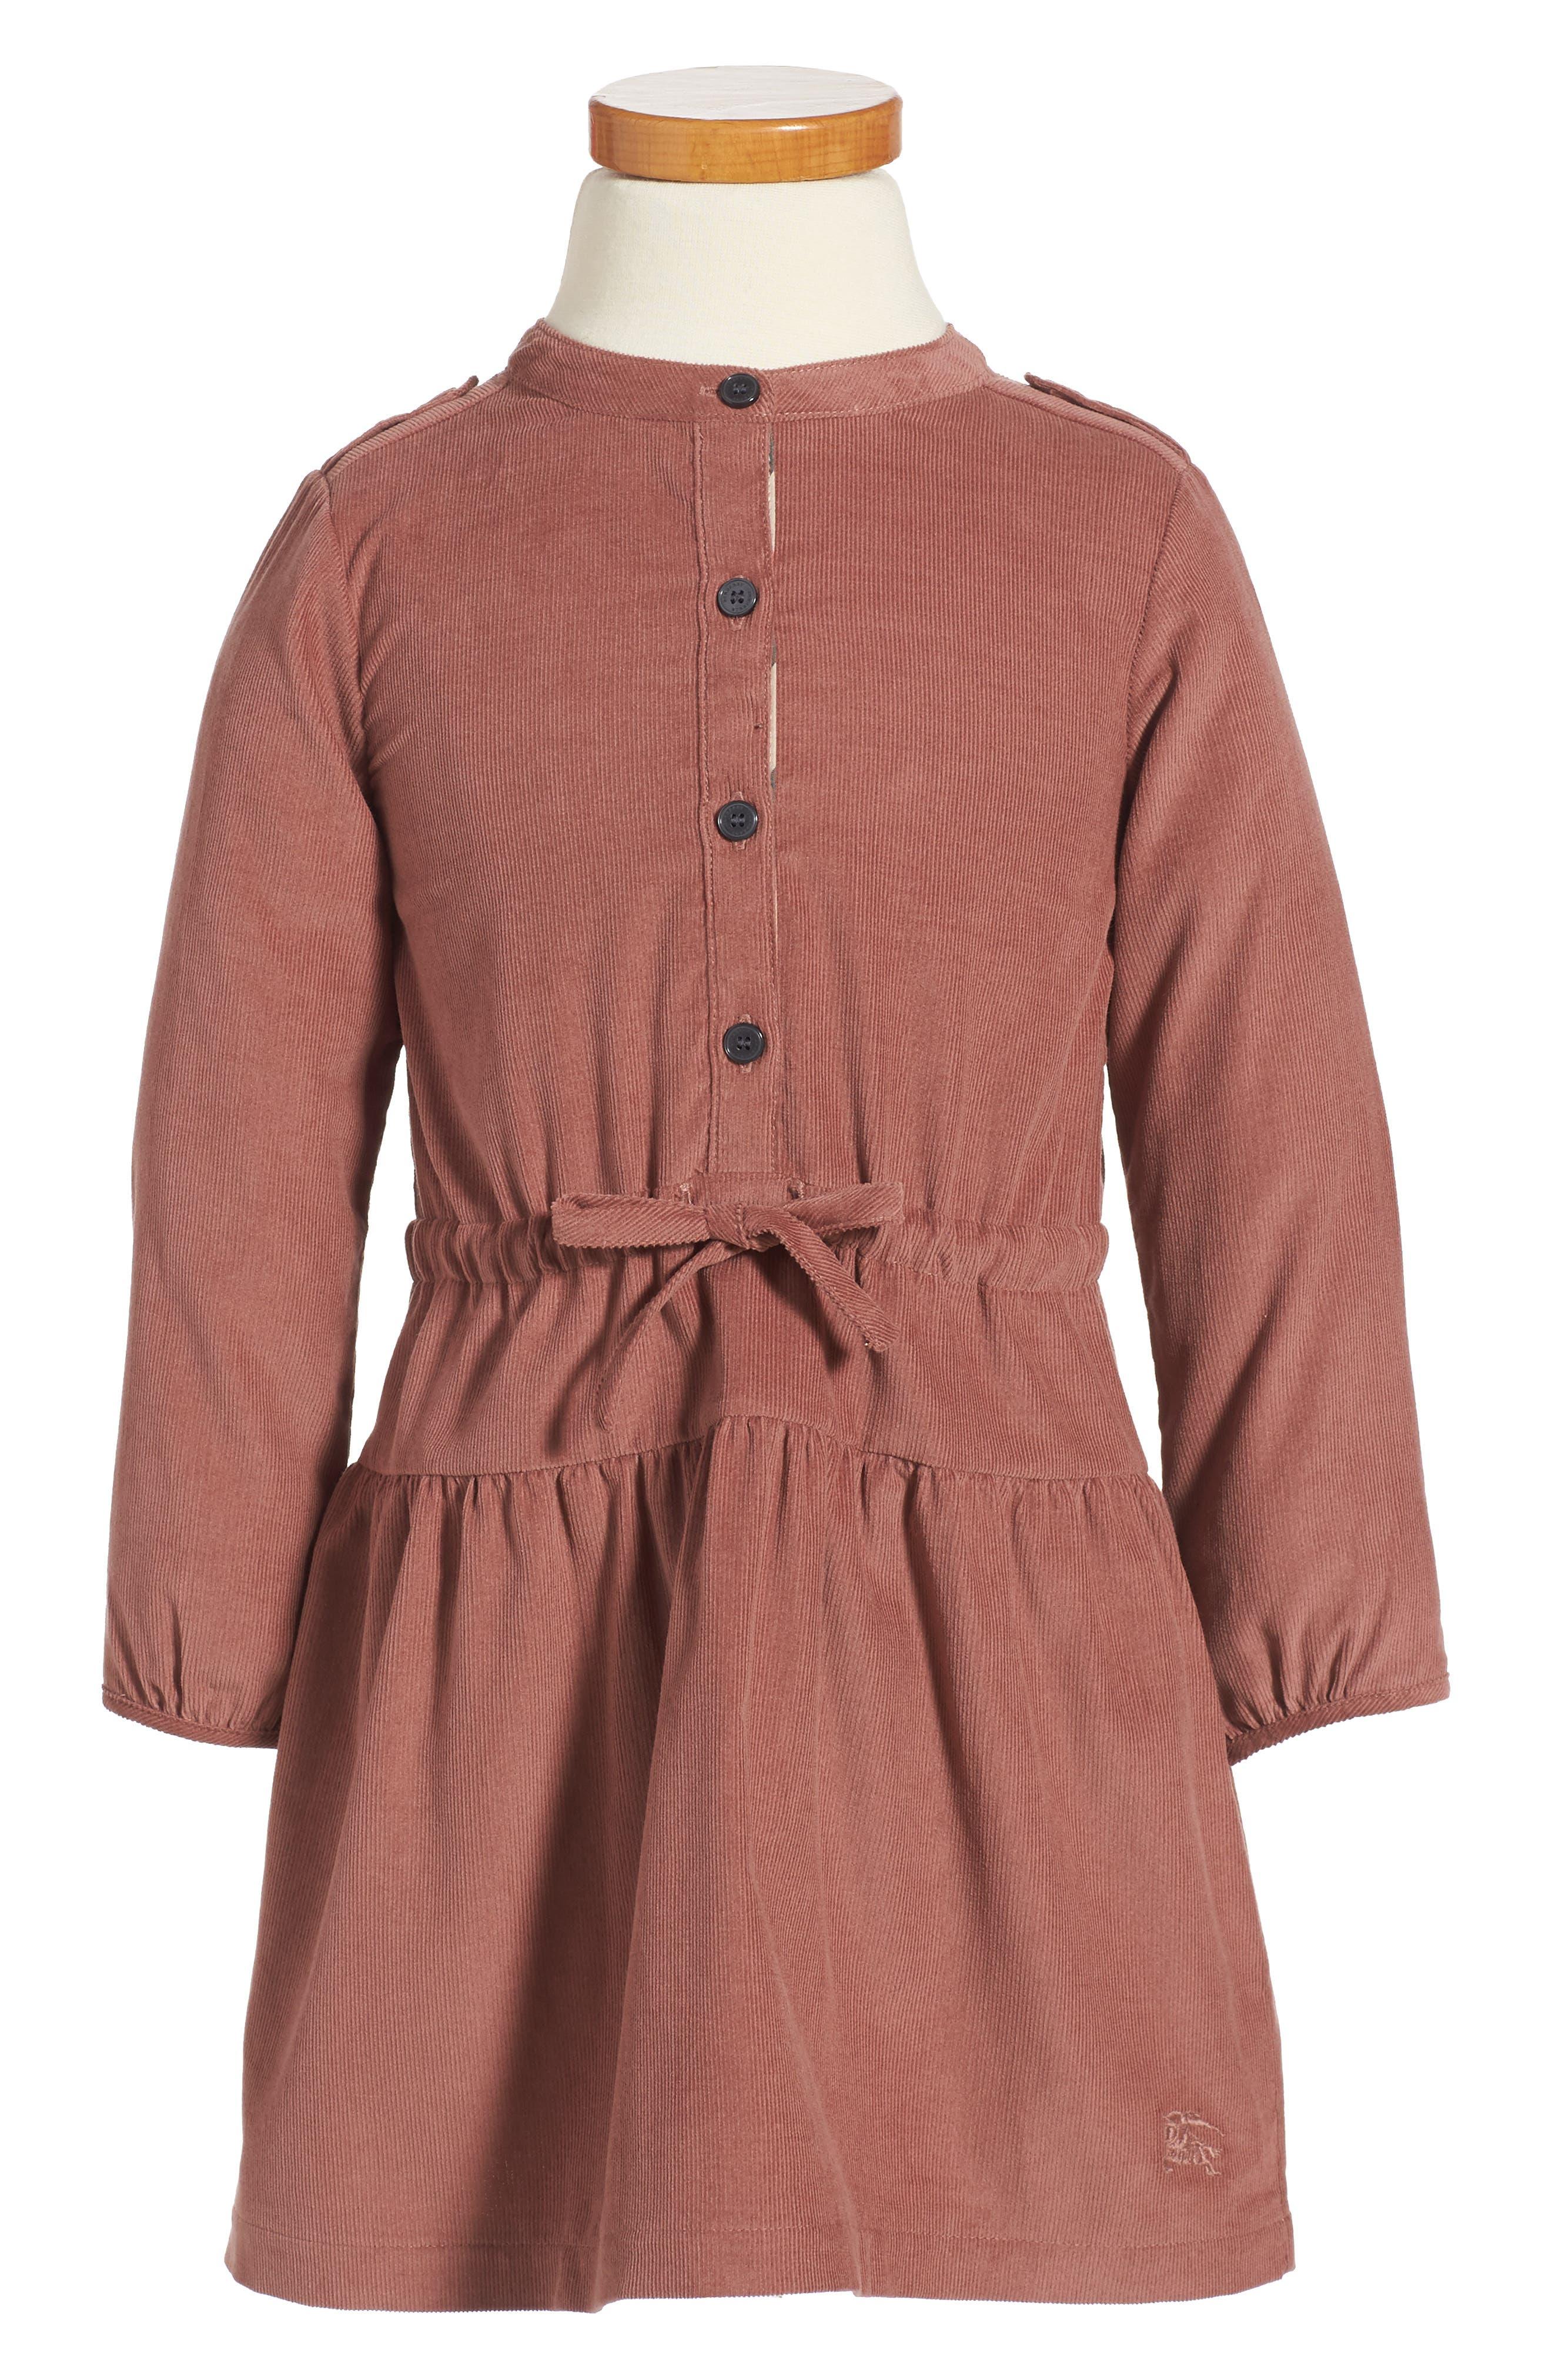 Alternate Image 1 Selected - Burberry Mini Celestine Corduroy Dress (Toddler Girls)